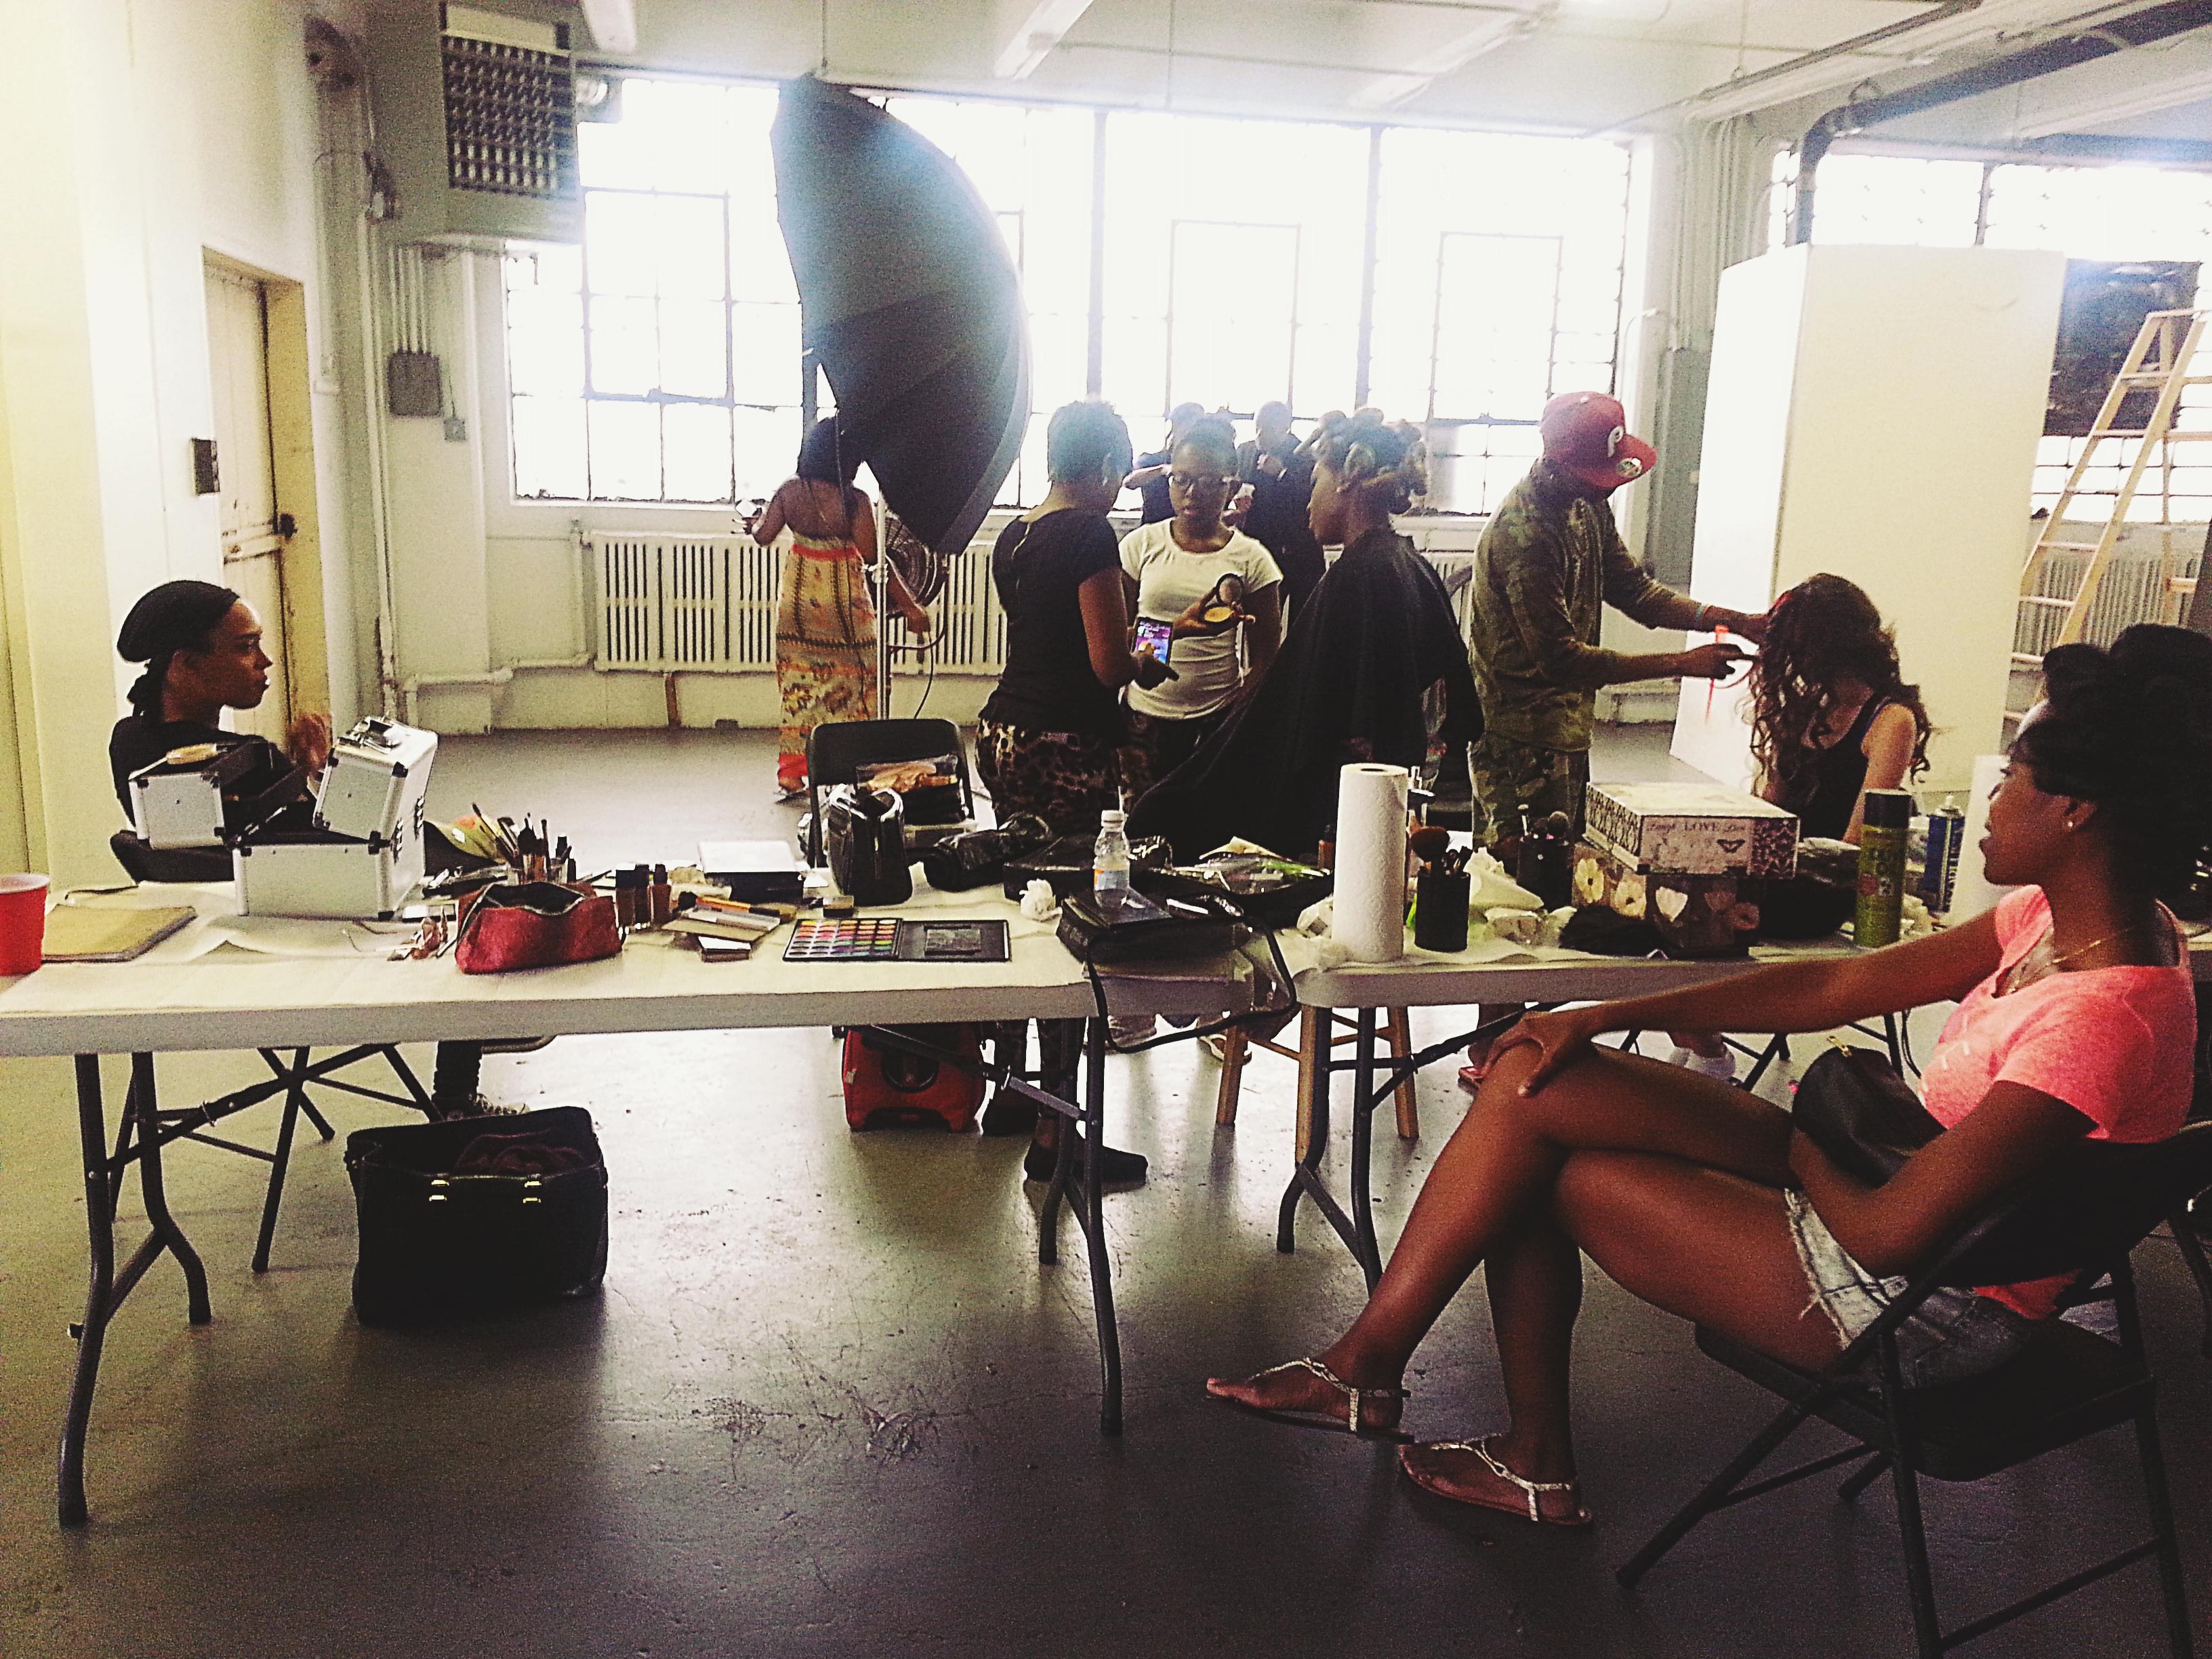 Behind the Scenes Shoot: UDE Models